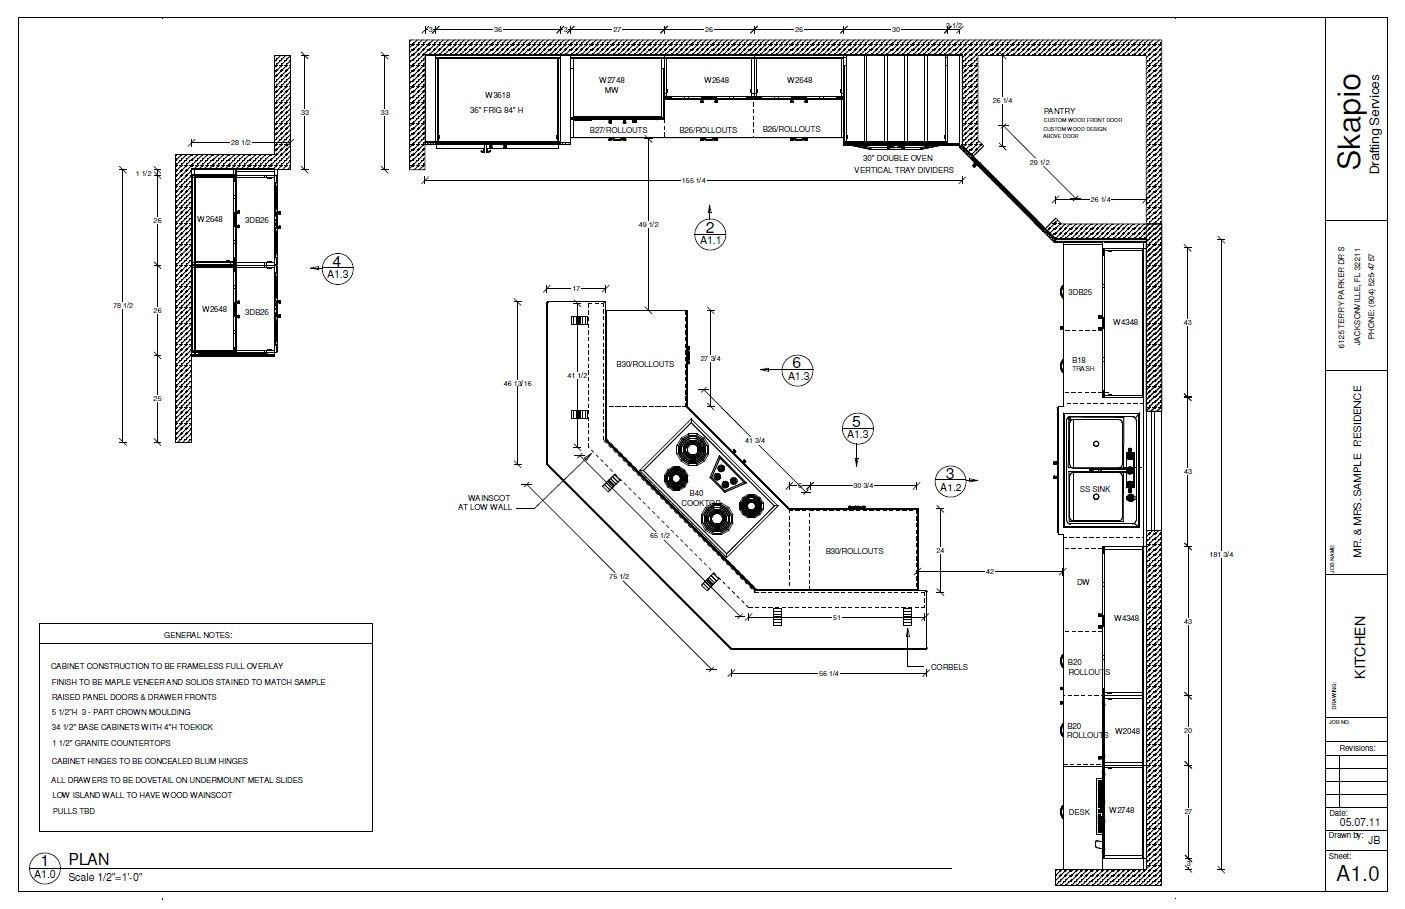 16 X 16 Kitchen Layout Sample Kitchen Floor Plan Shop Drawings